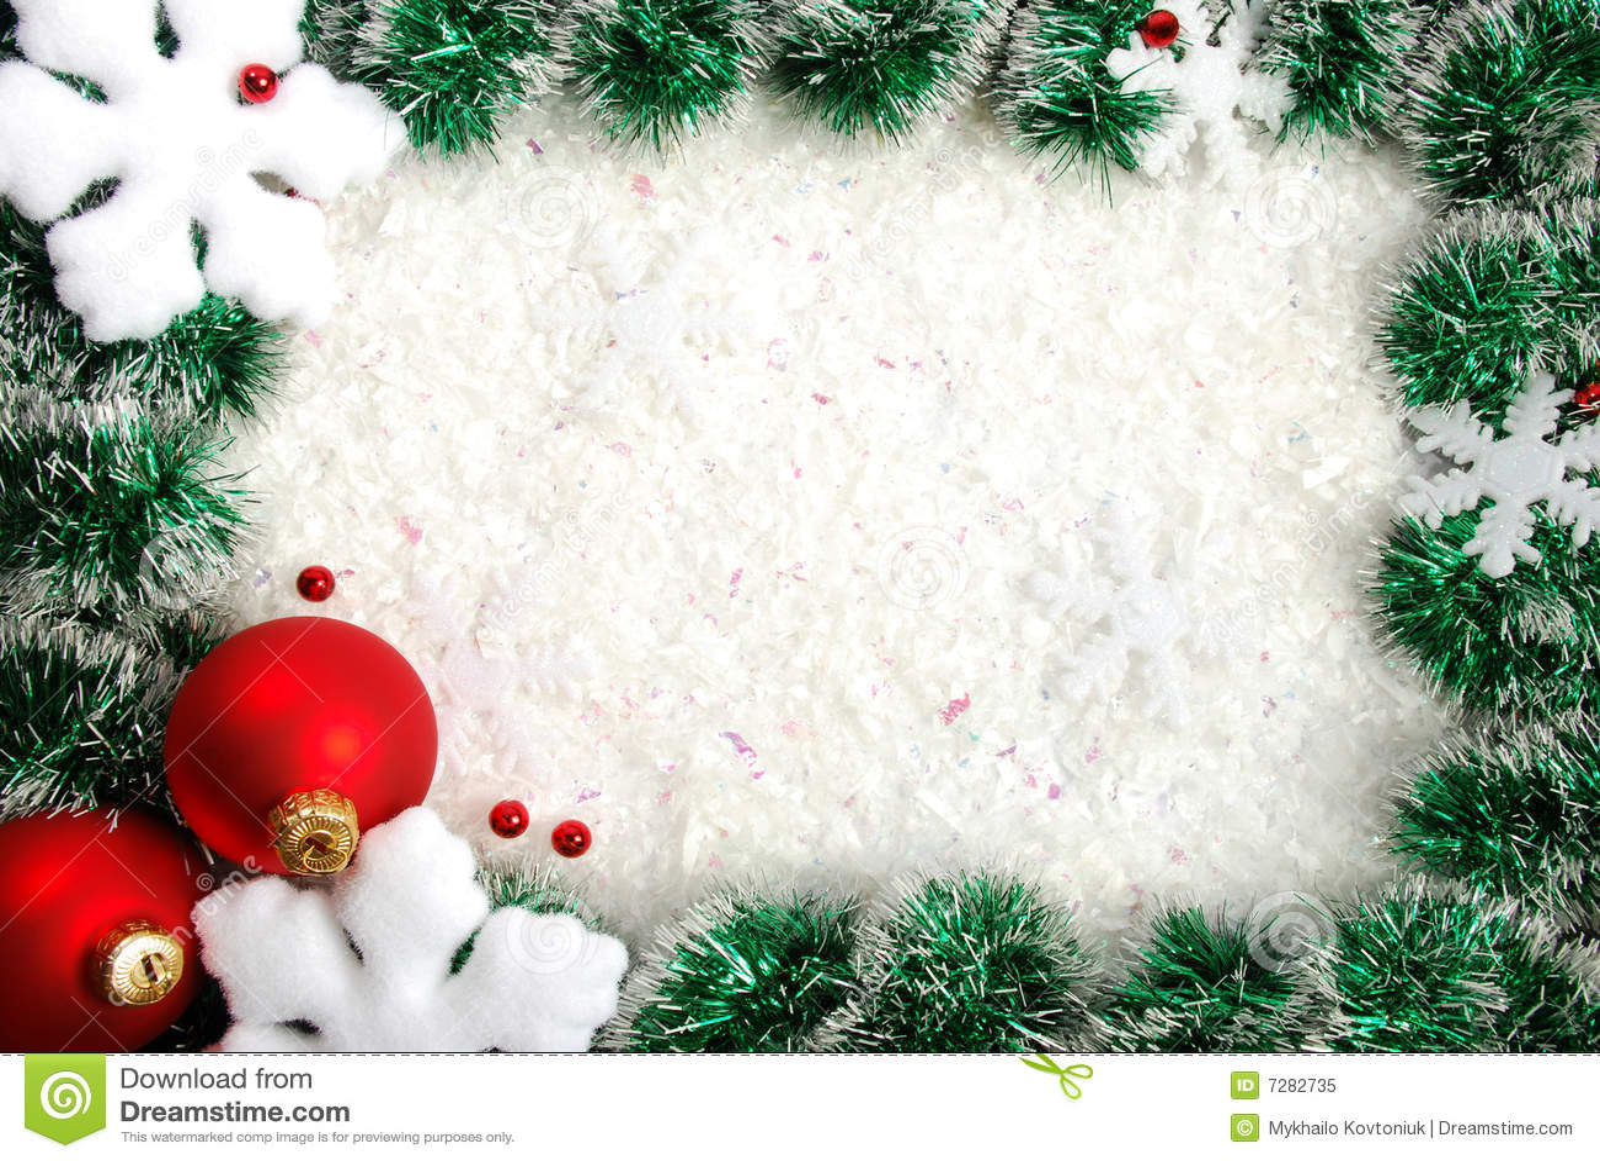 Christmas Border Royalty Free Stock Photo Image 7282735